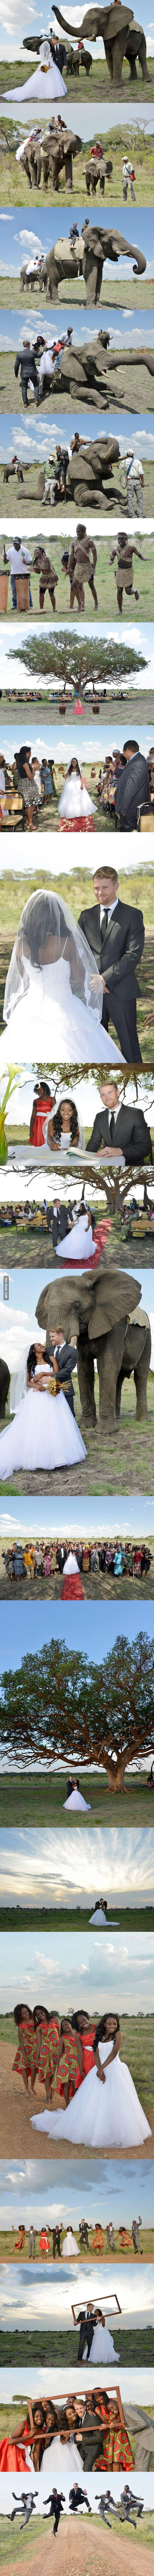 crazy wedding photoshoot!